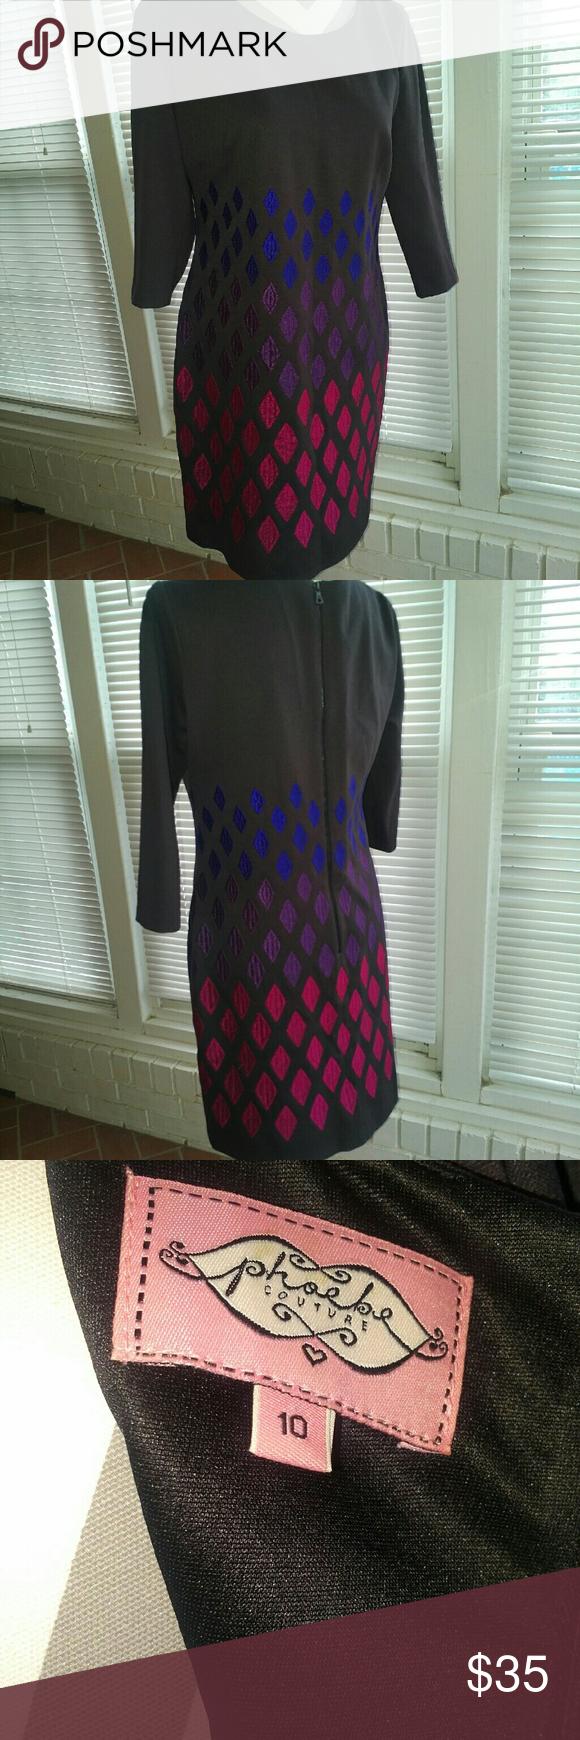 Phoebe Couture sheath dress Phoebe Couture sheath dress.  Excellent condition. Size 10 Phoebe Couture Dresses Midi